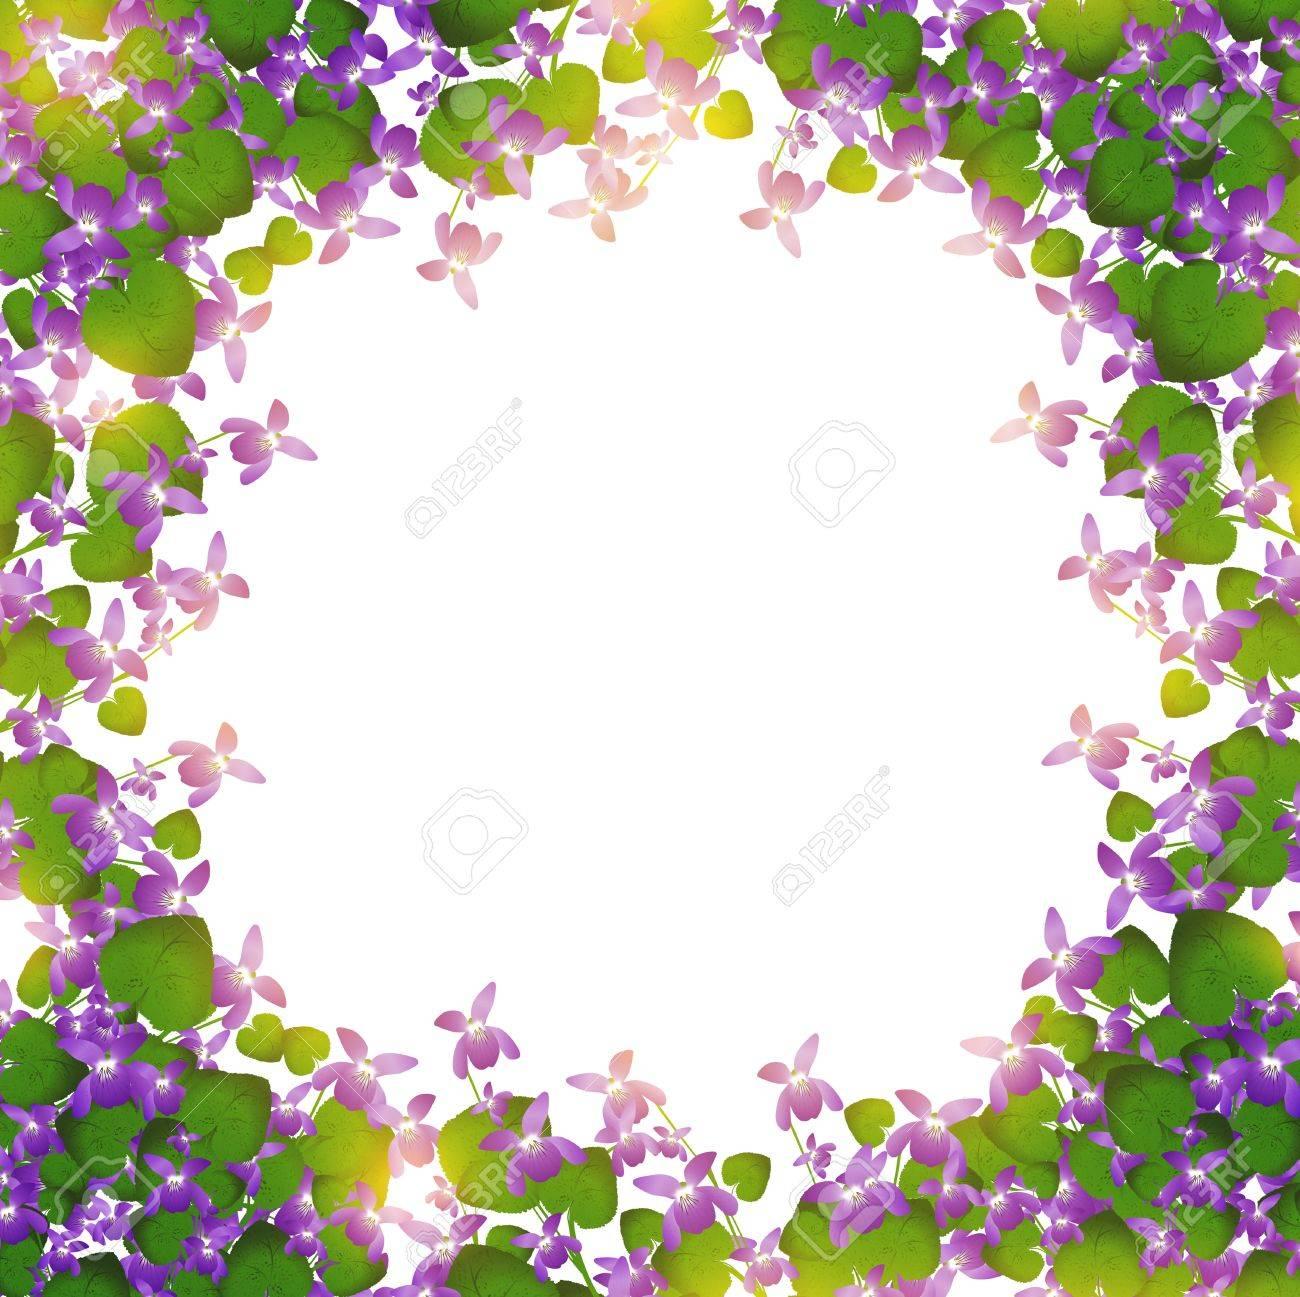 border of wild violet over white background - 12250528